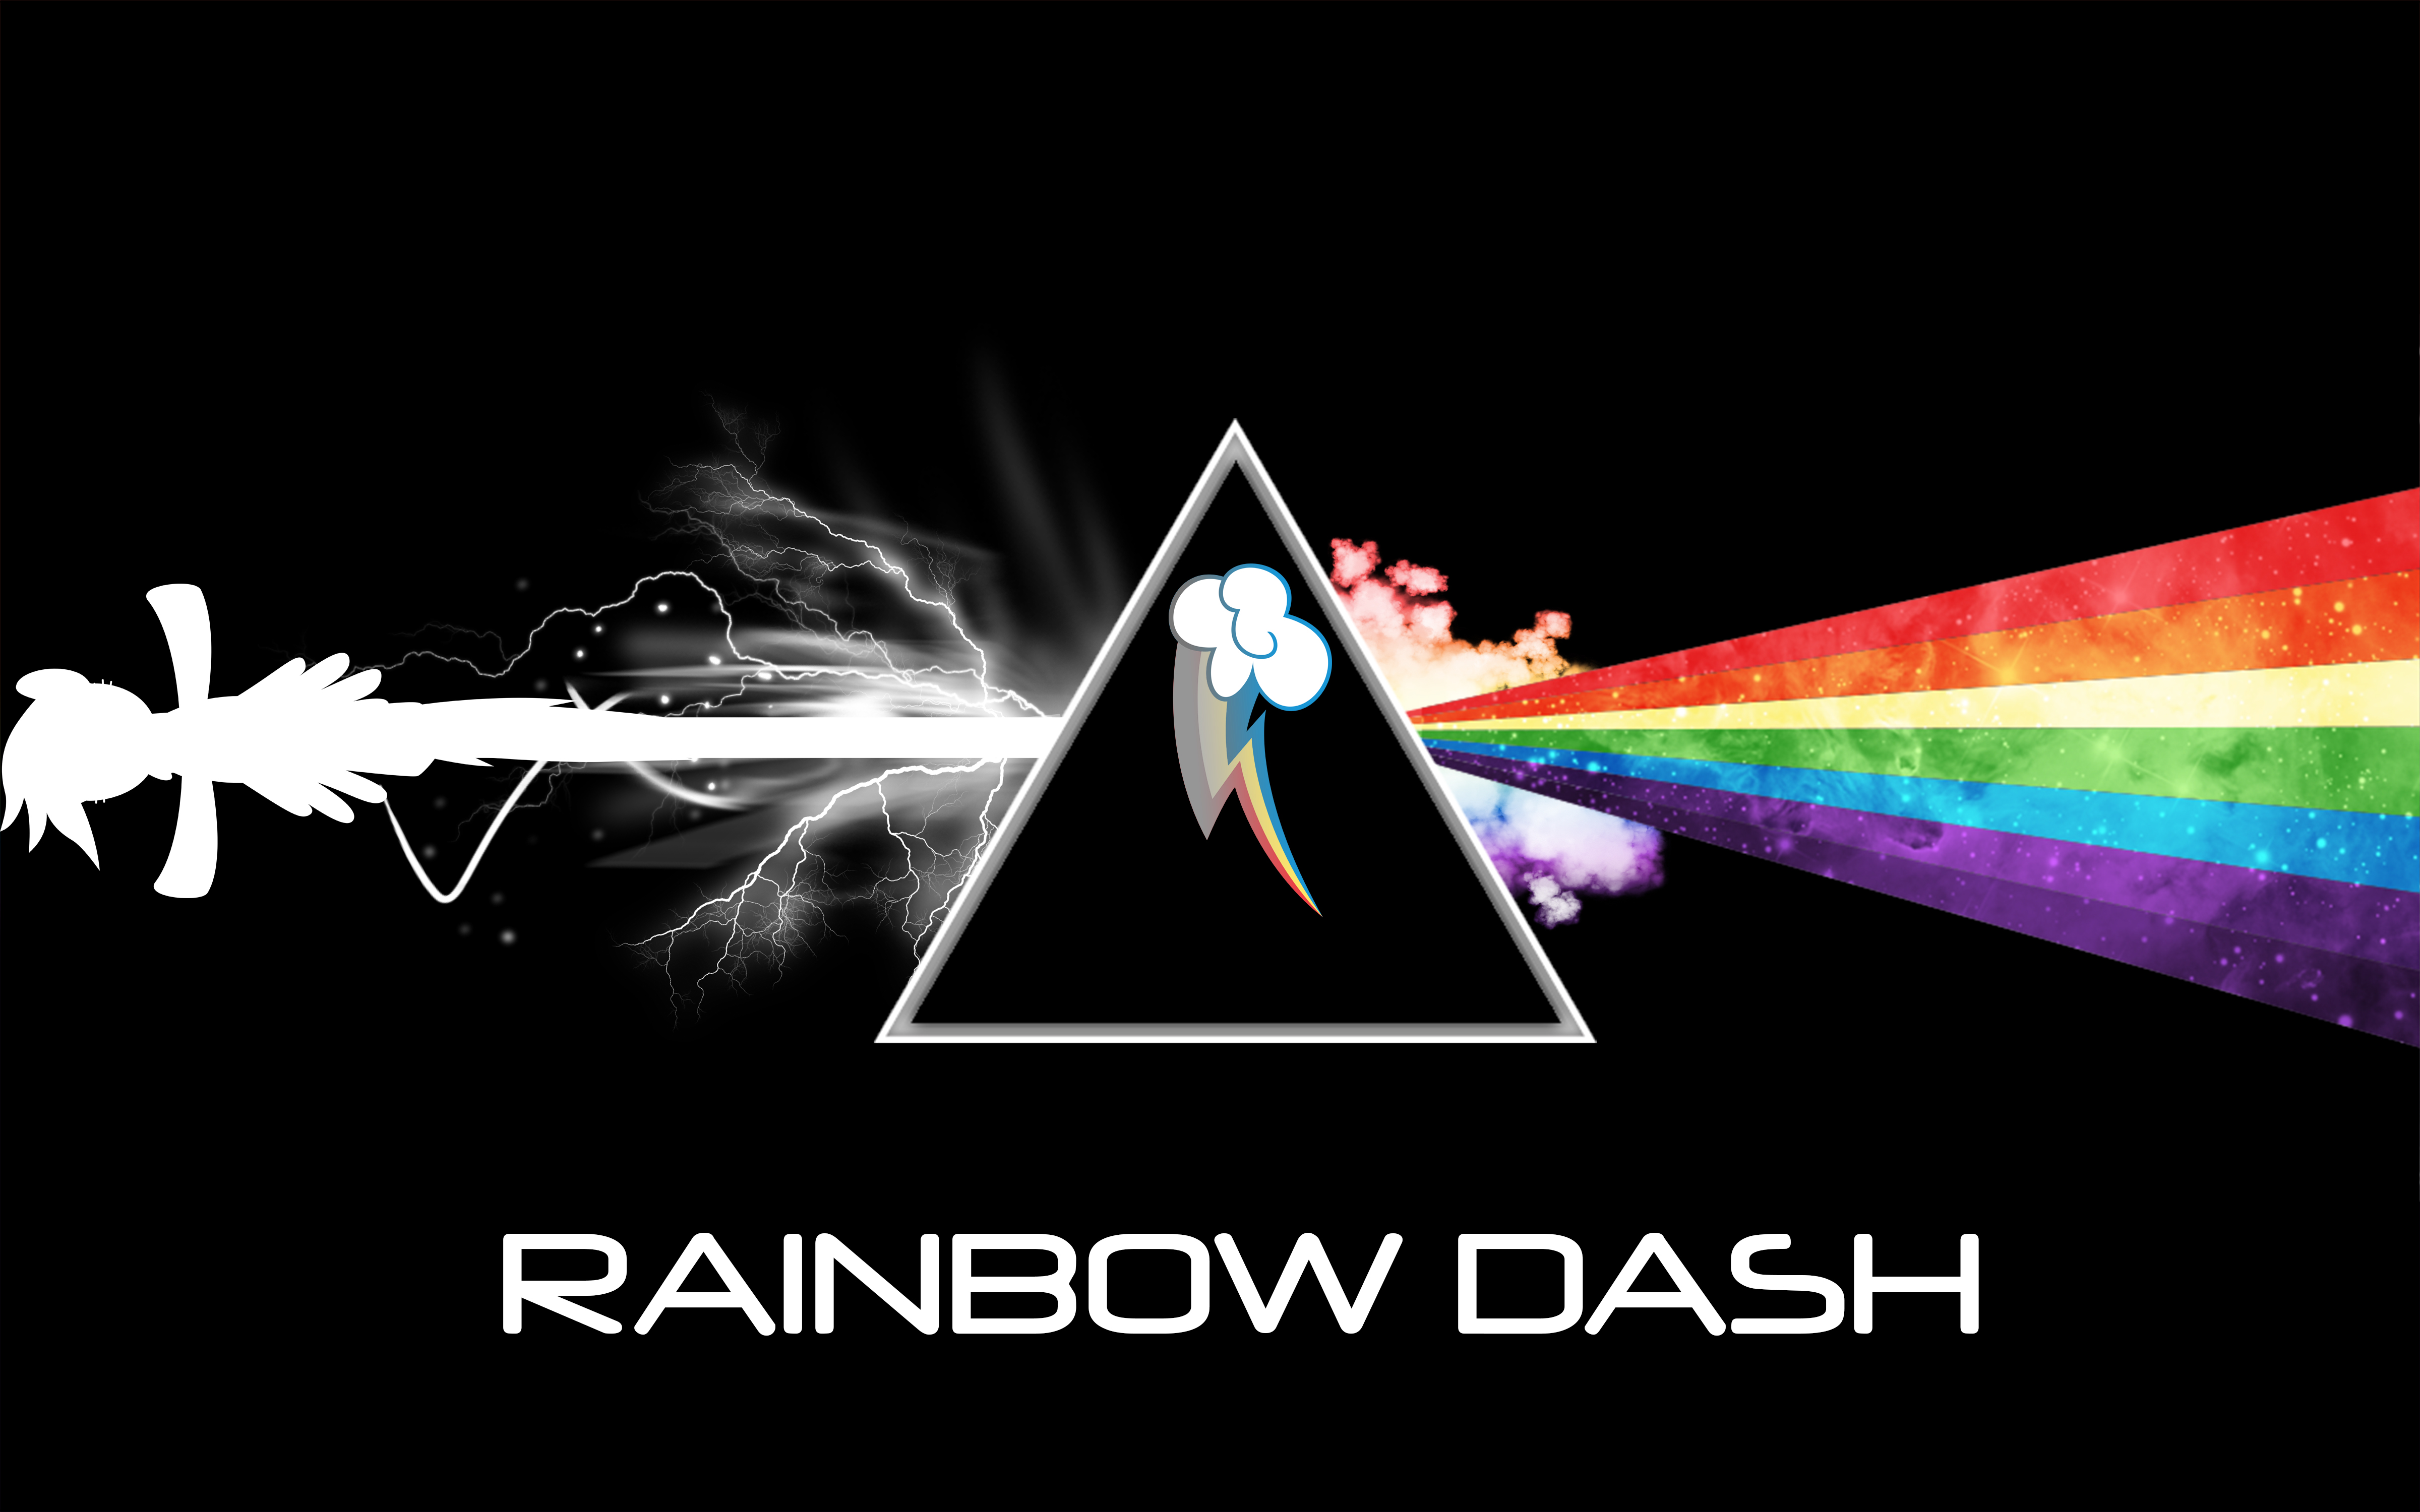 Rainbow Dash Wallpaper by HumblrPI on DeviantArt